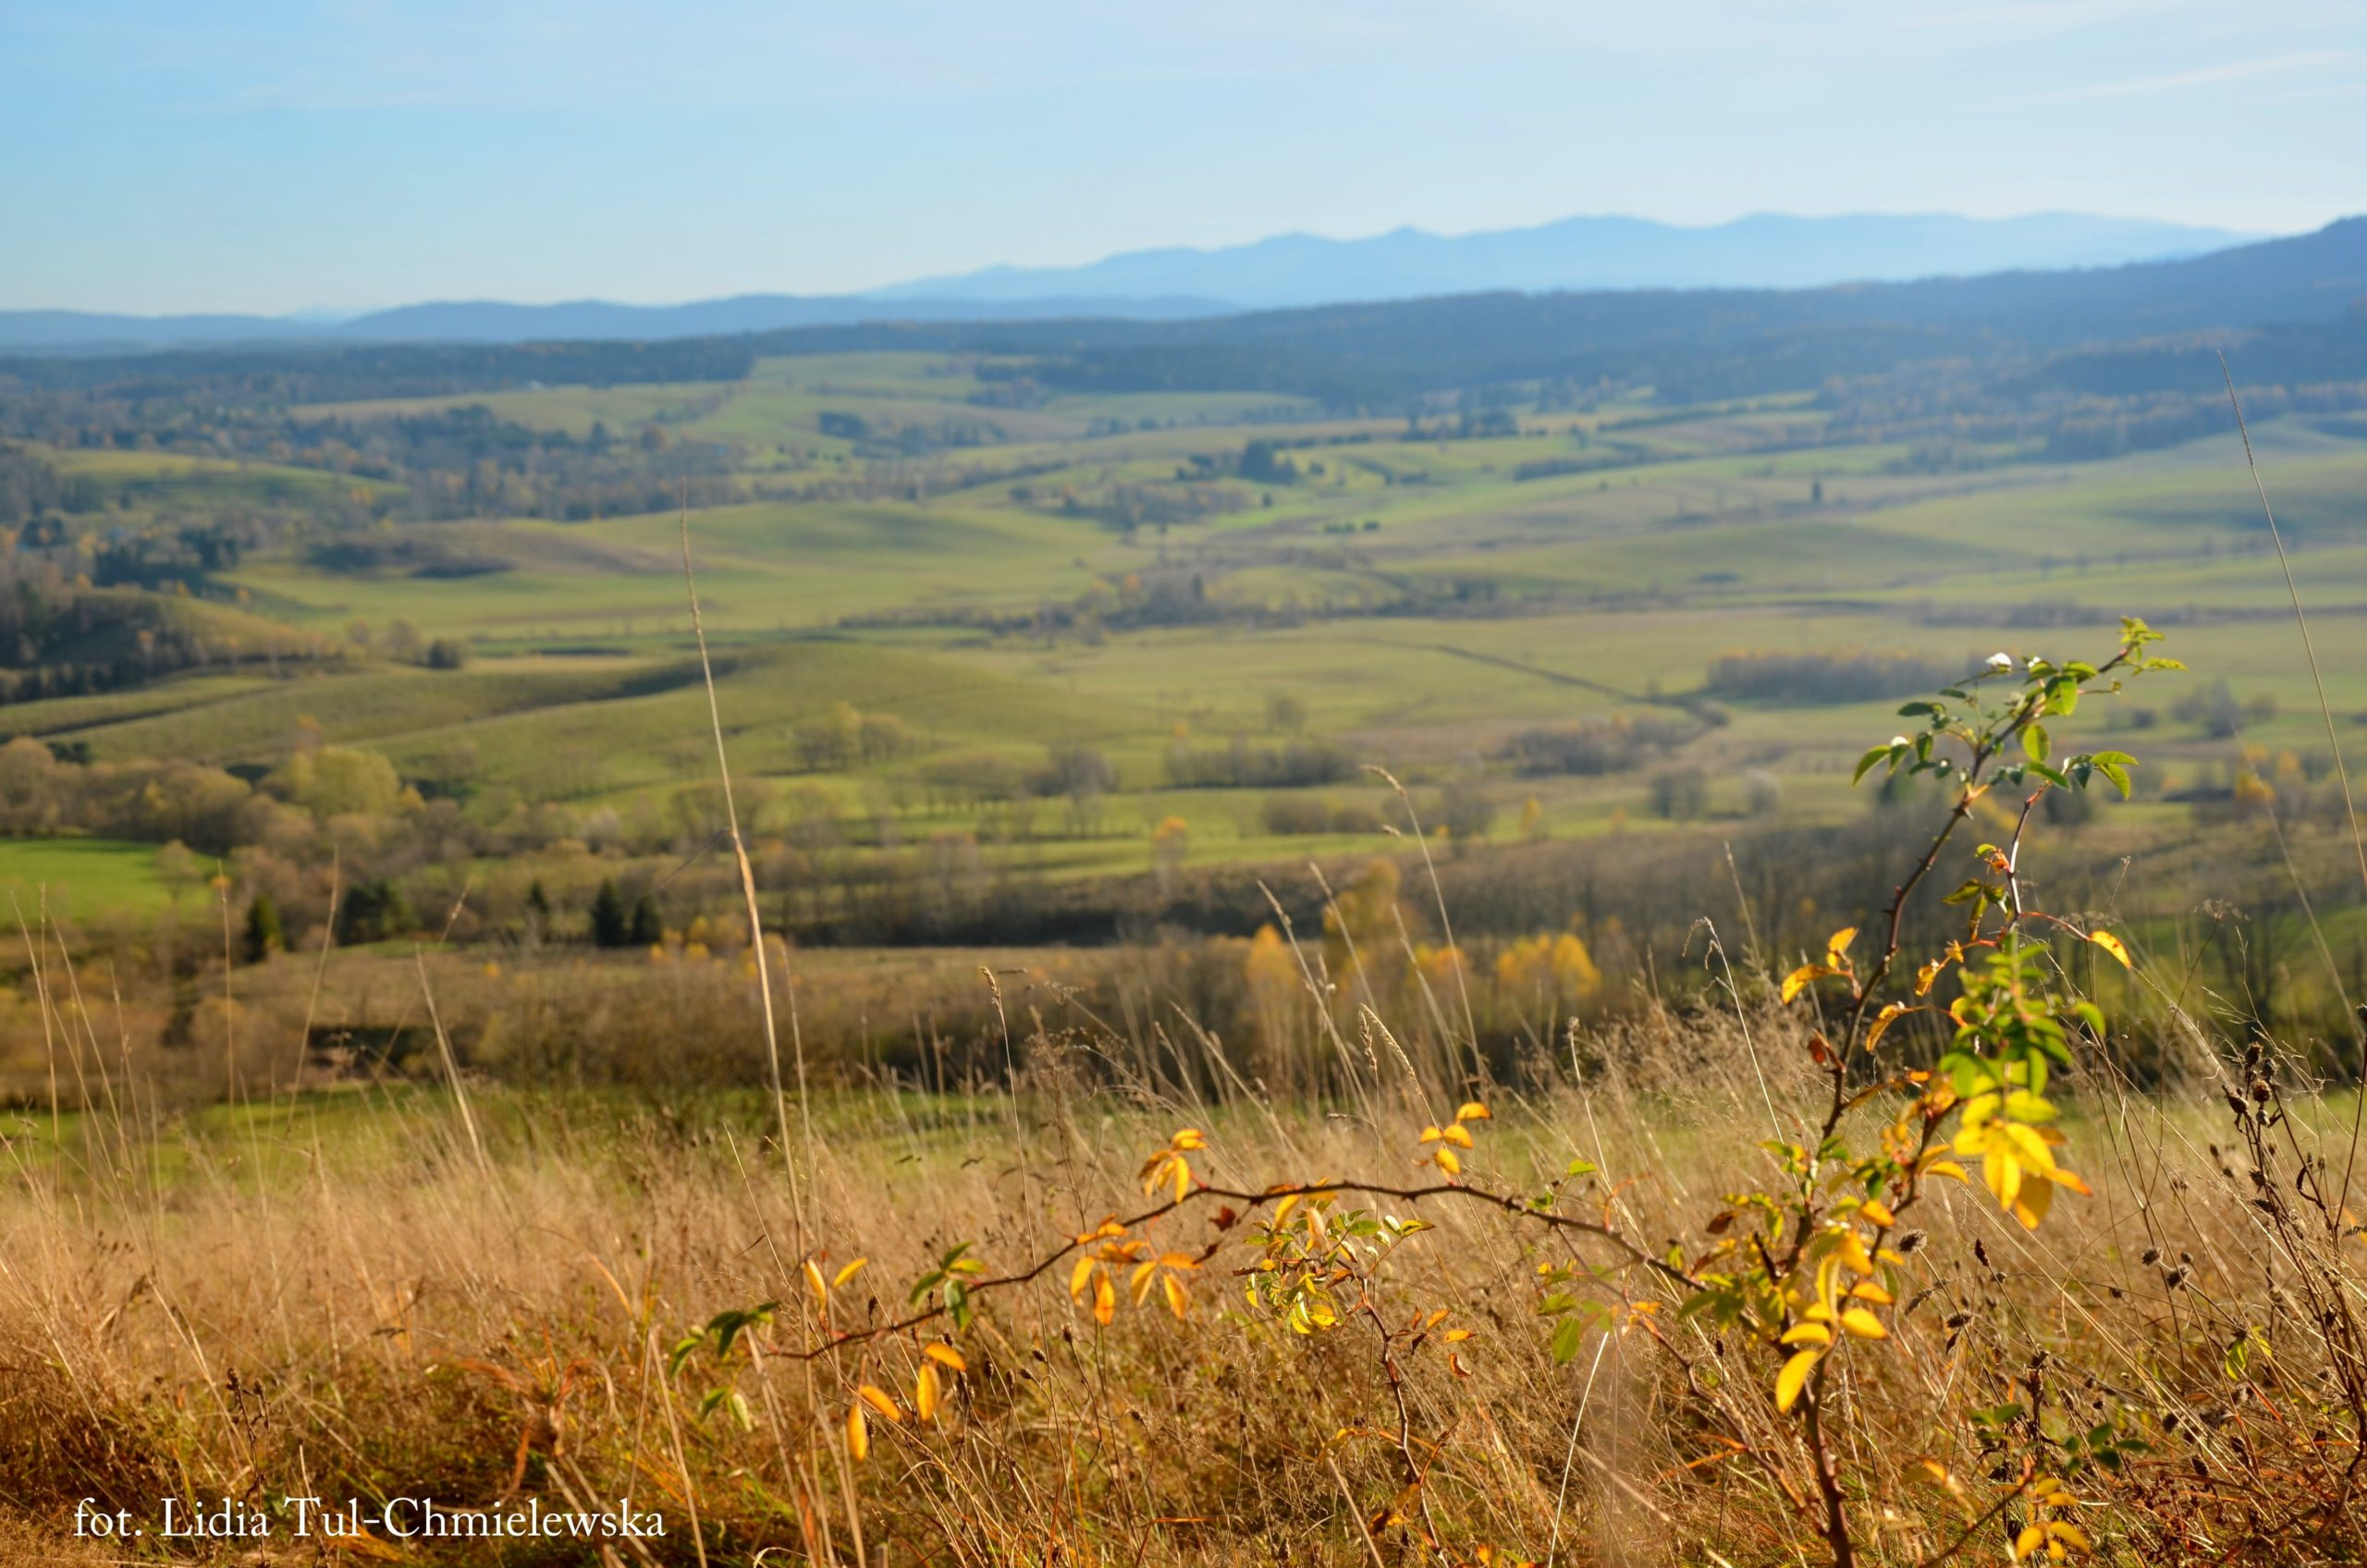 Listopad i Kraina Lipecka fot. Lidia Tul-Chmielewska